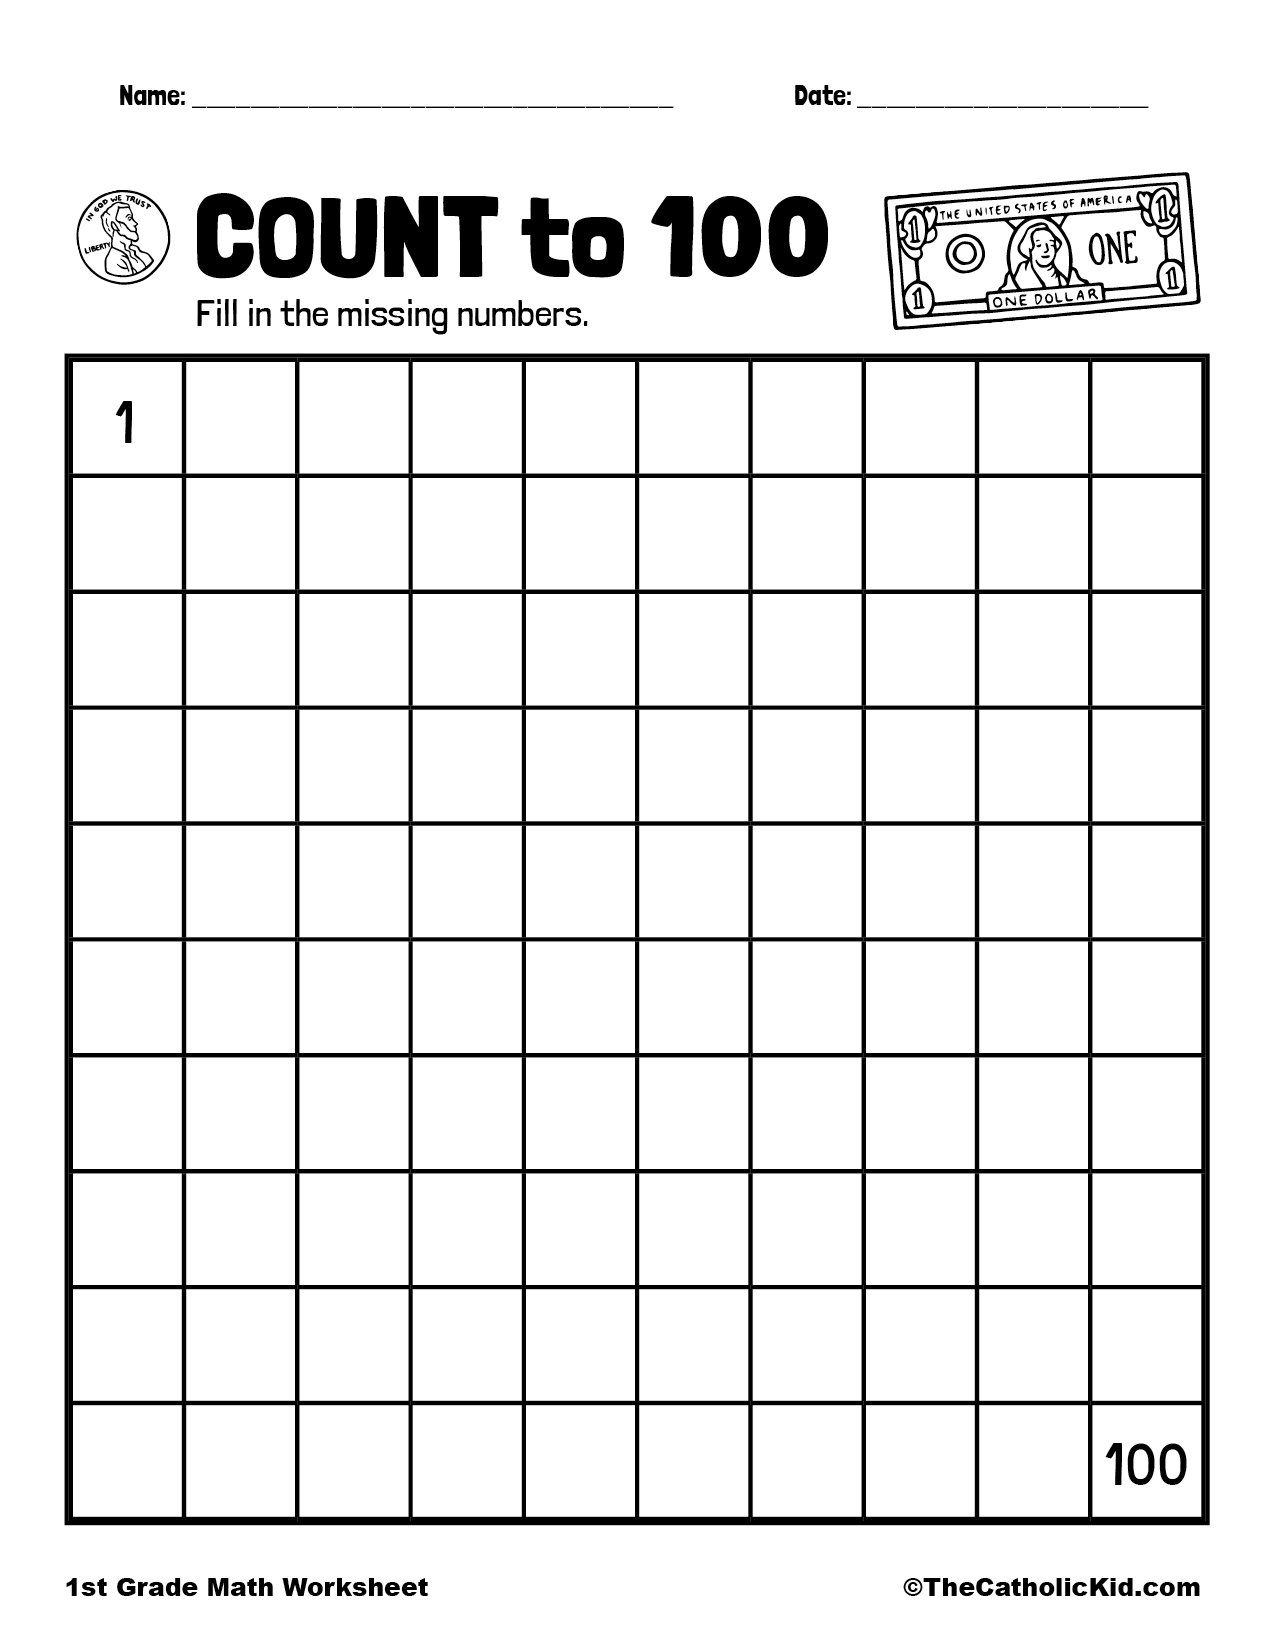 1st Grade Math Catholic Themed Worksheet Count to 100